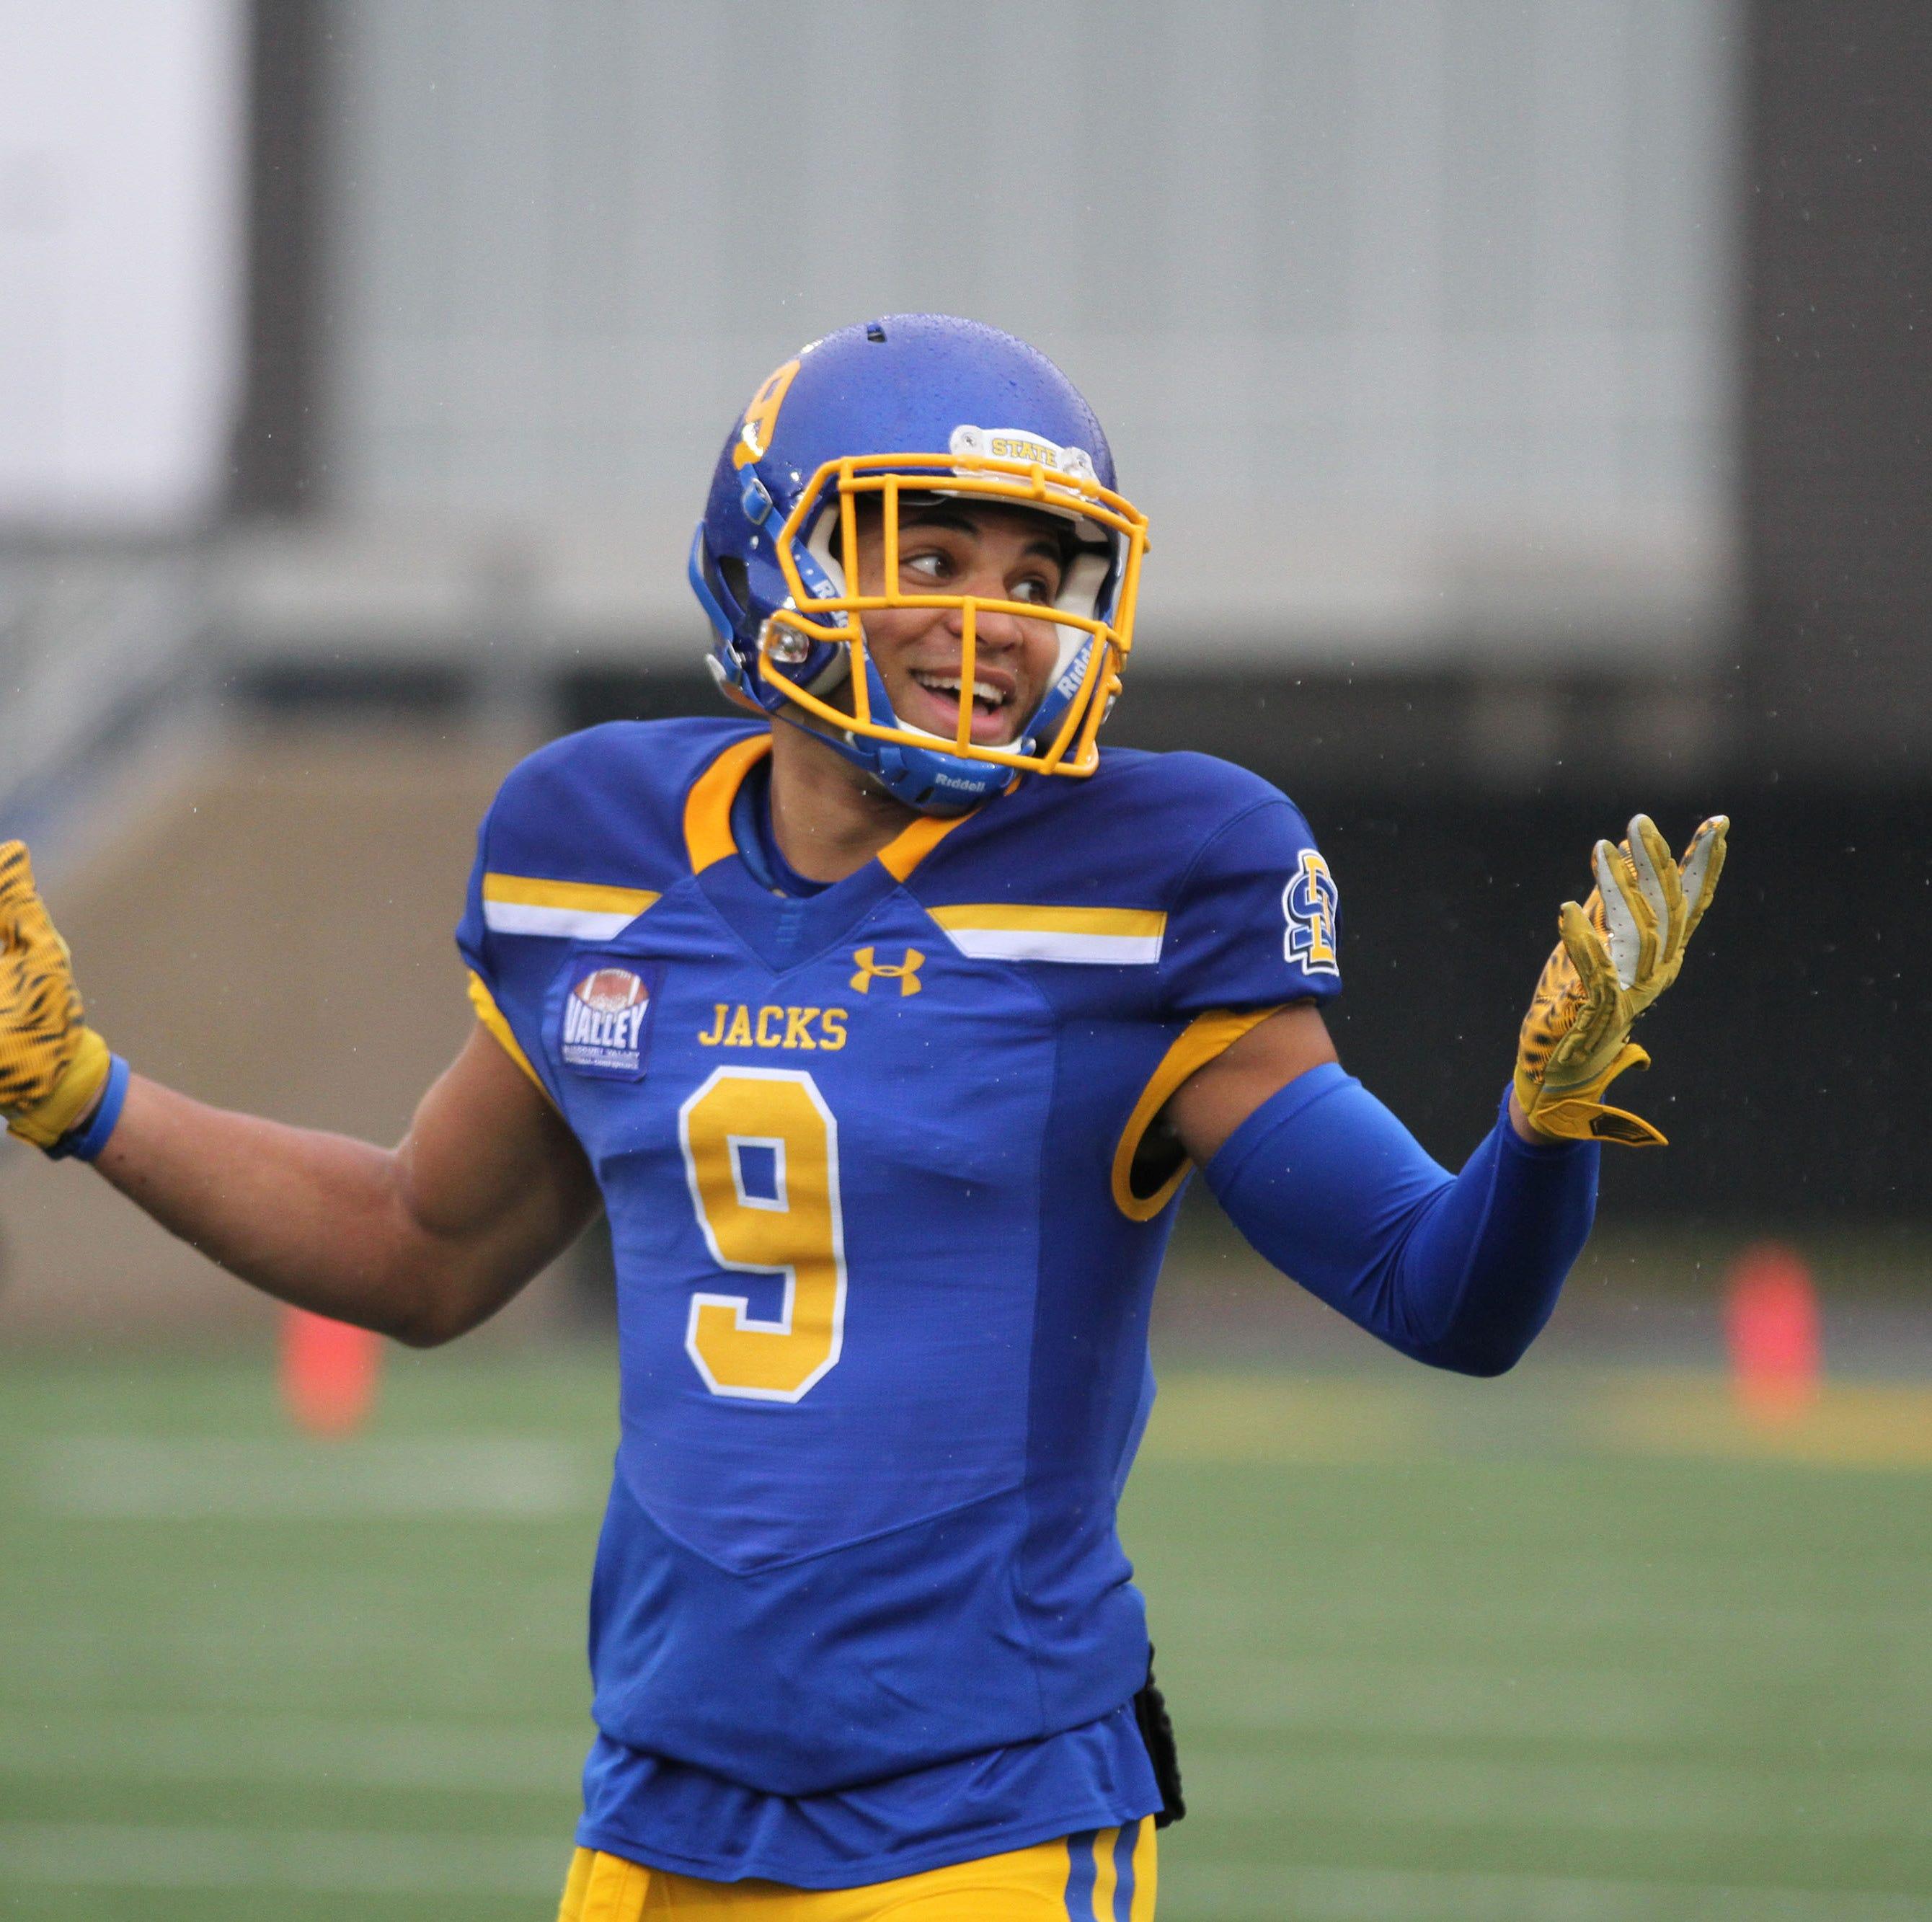 NFL Draft: Jordan Brown, Trey Pipkins among area hopefuls hoping for the call